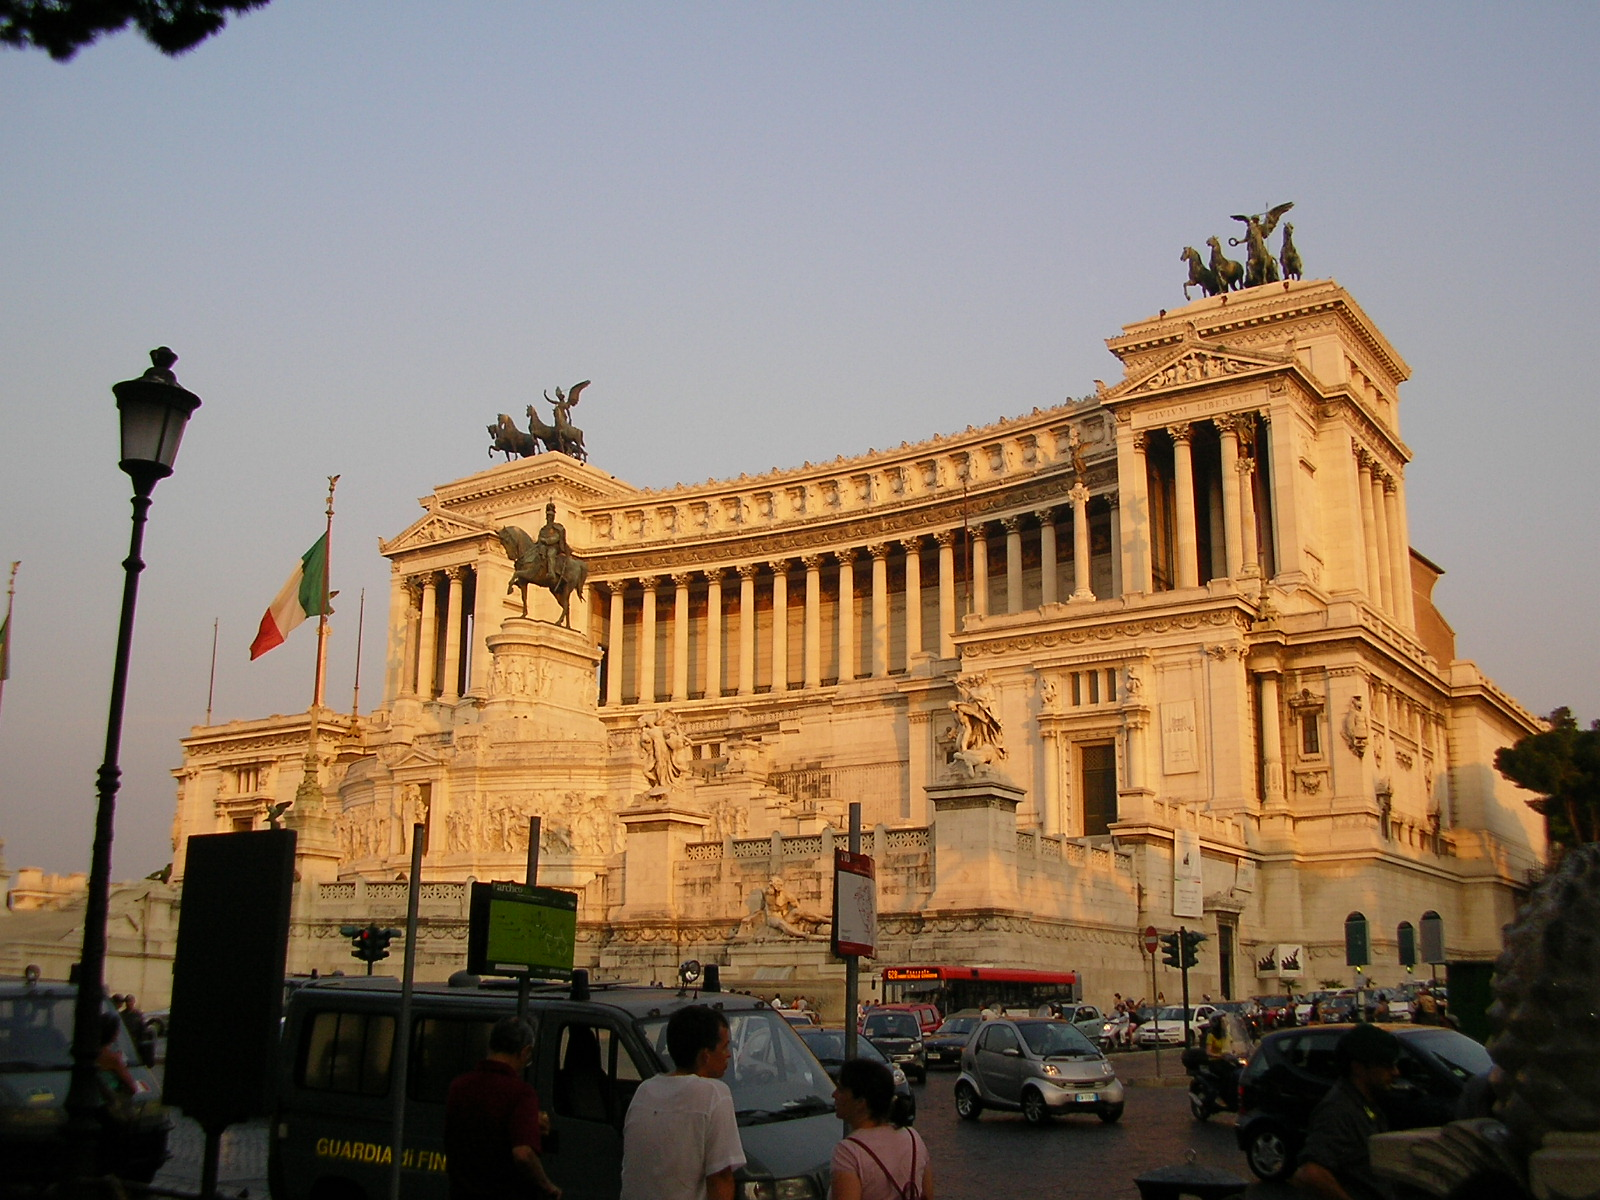 roma - photo #34